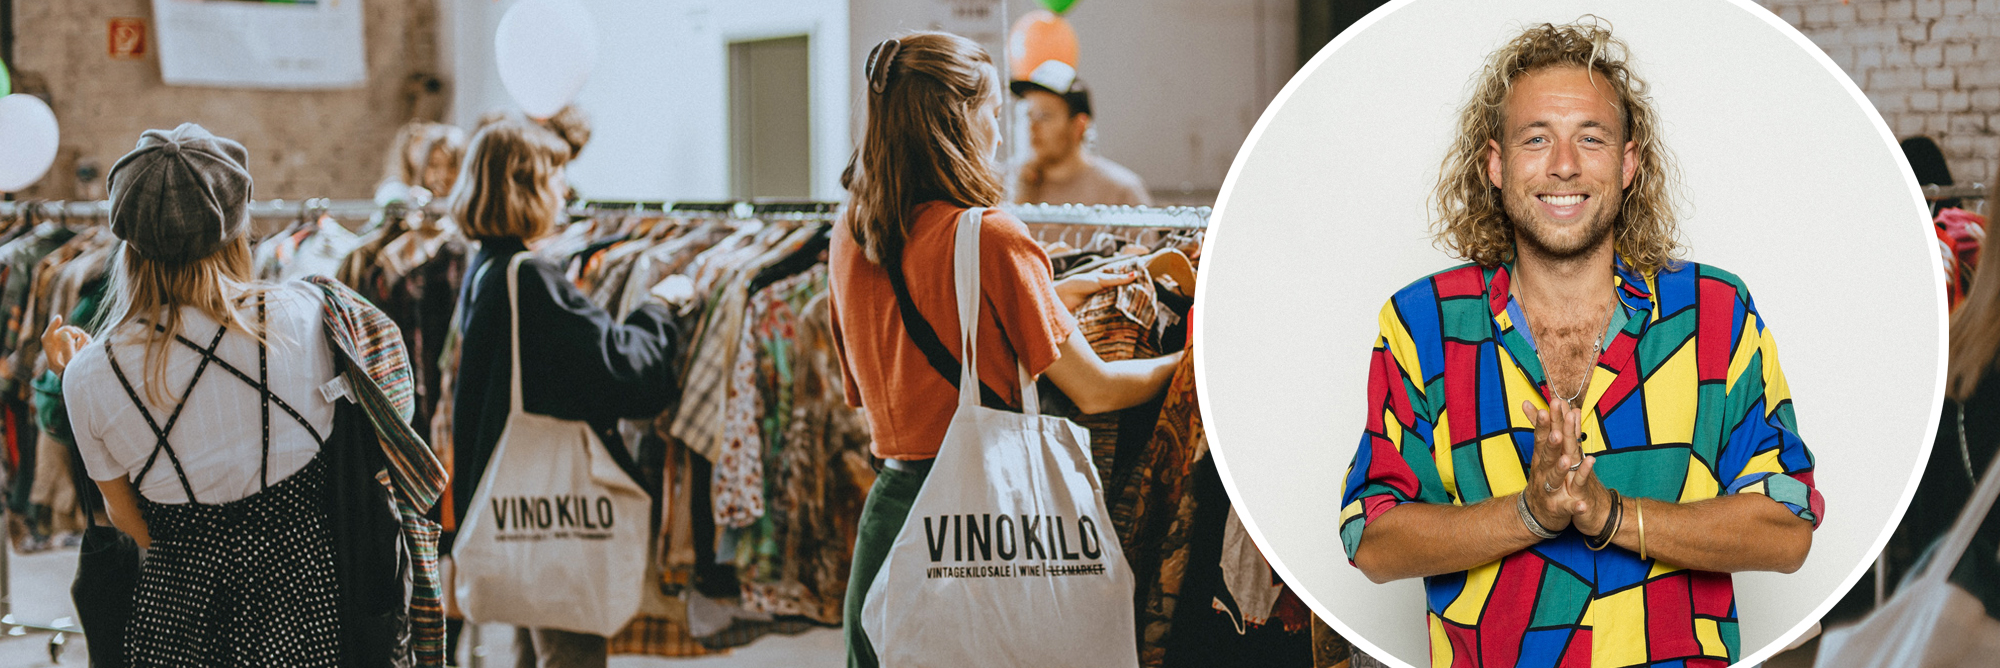 The new new VinoKilo – Interview mit Robin Balser